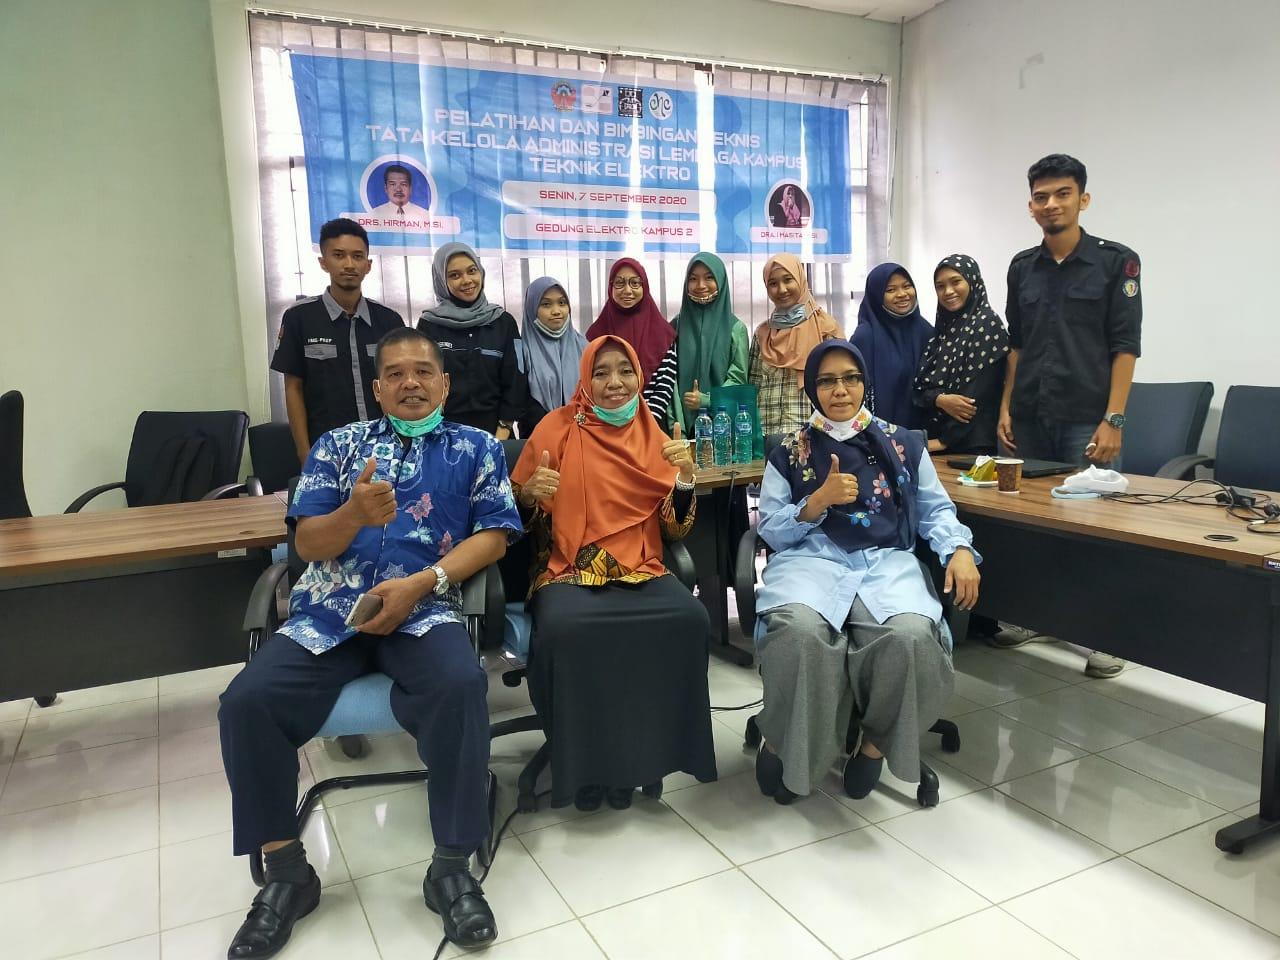 Pelatihan dan Bimbingan Teknis Tata Kelola Administrasi Lembaga Kampus